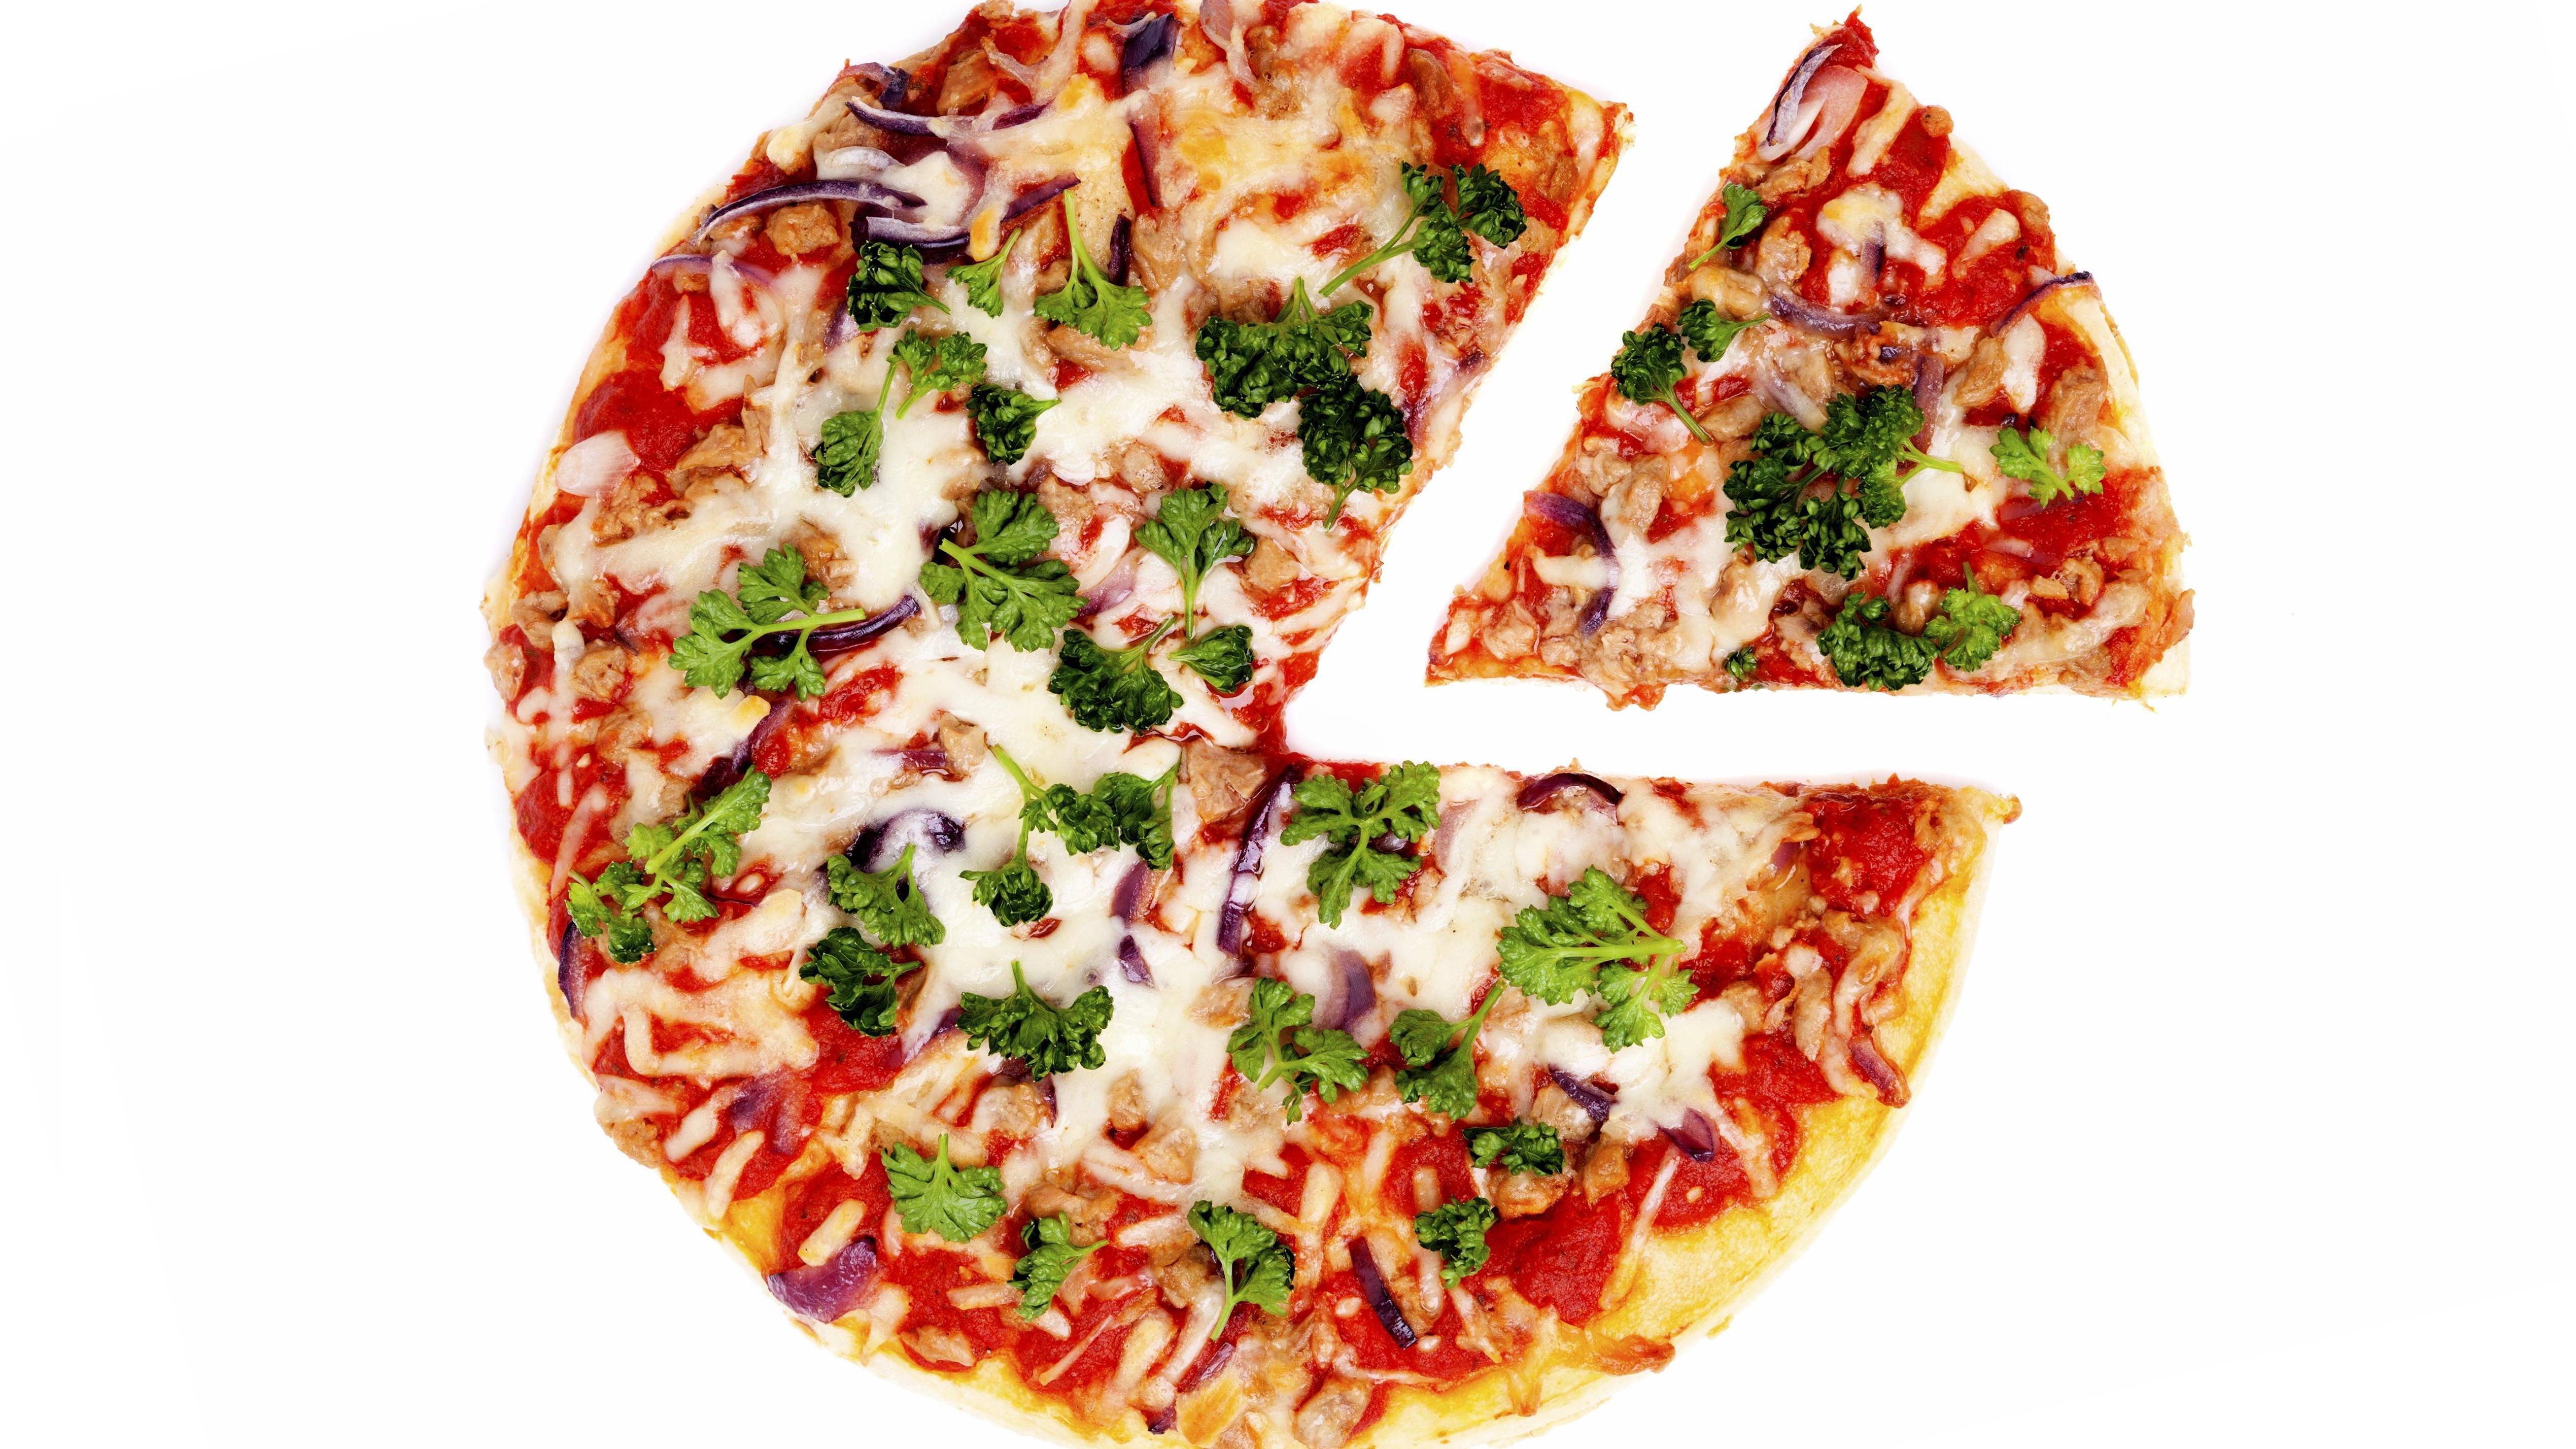 Pizza ohne Ruhen: Schnelles, leckeres Rezept